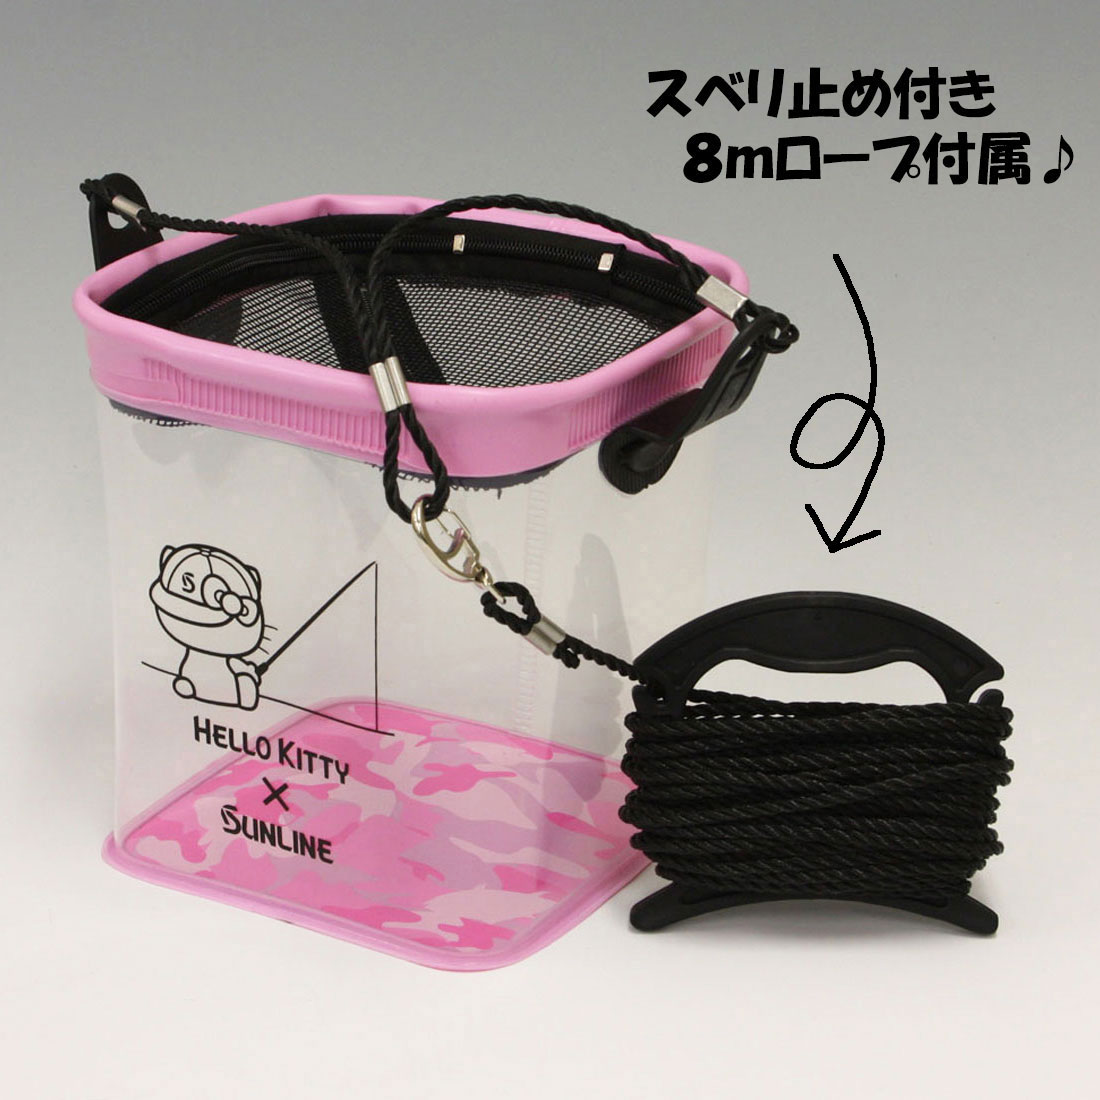 Hello Kitty 水汲みバケツ 21SK−01